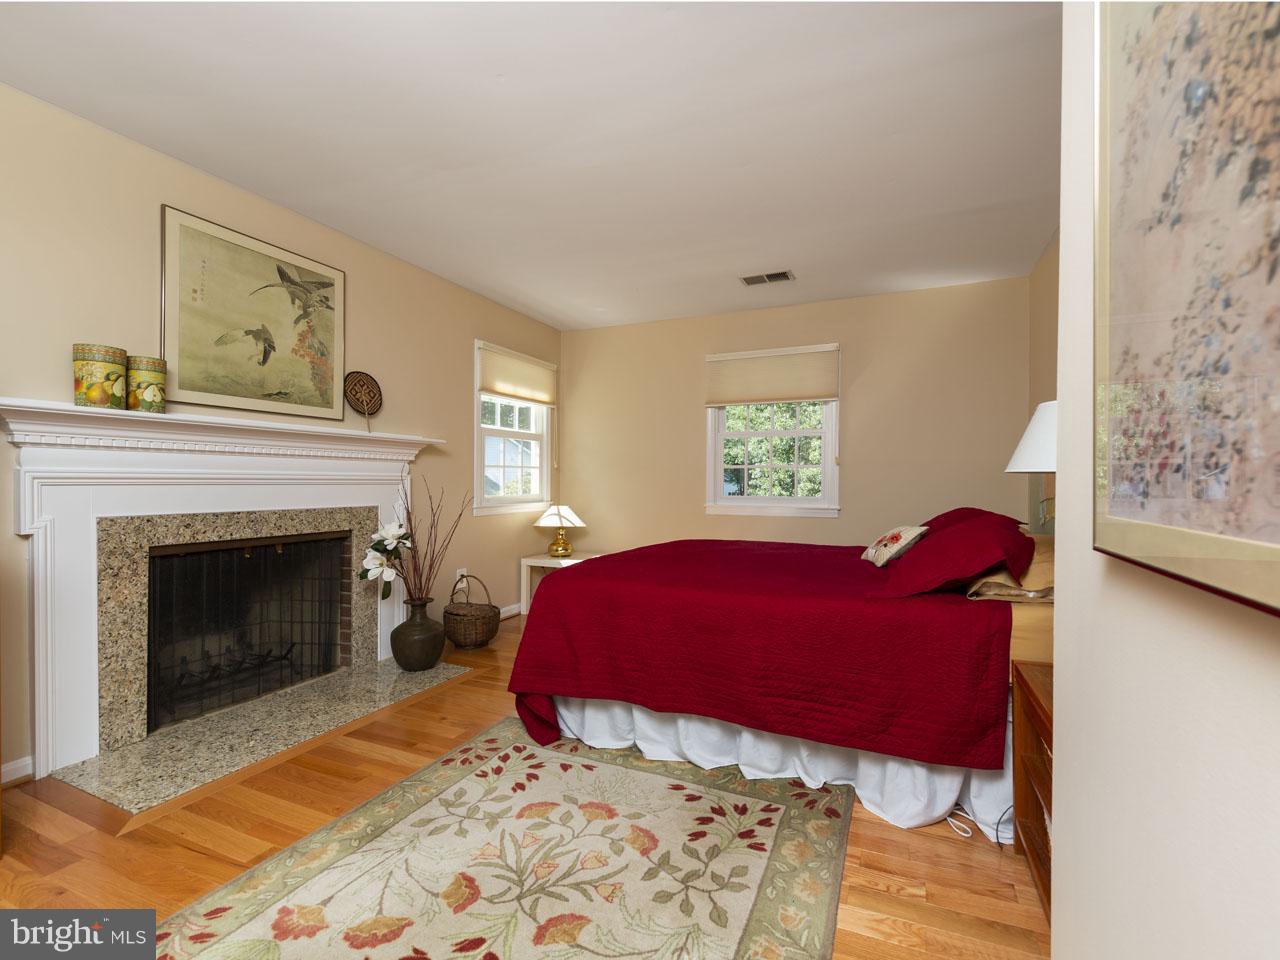 1006211278-300688039466-2021-07-22-07-39-38        Burke Delaware Real Estate For Sale   MLS# 1006211278  - Best of Northern Virginia